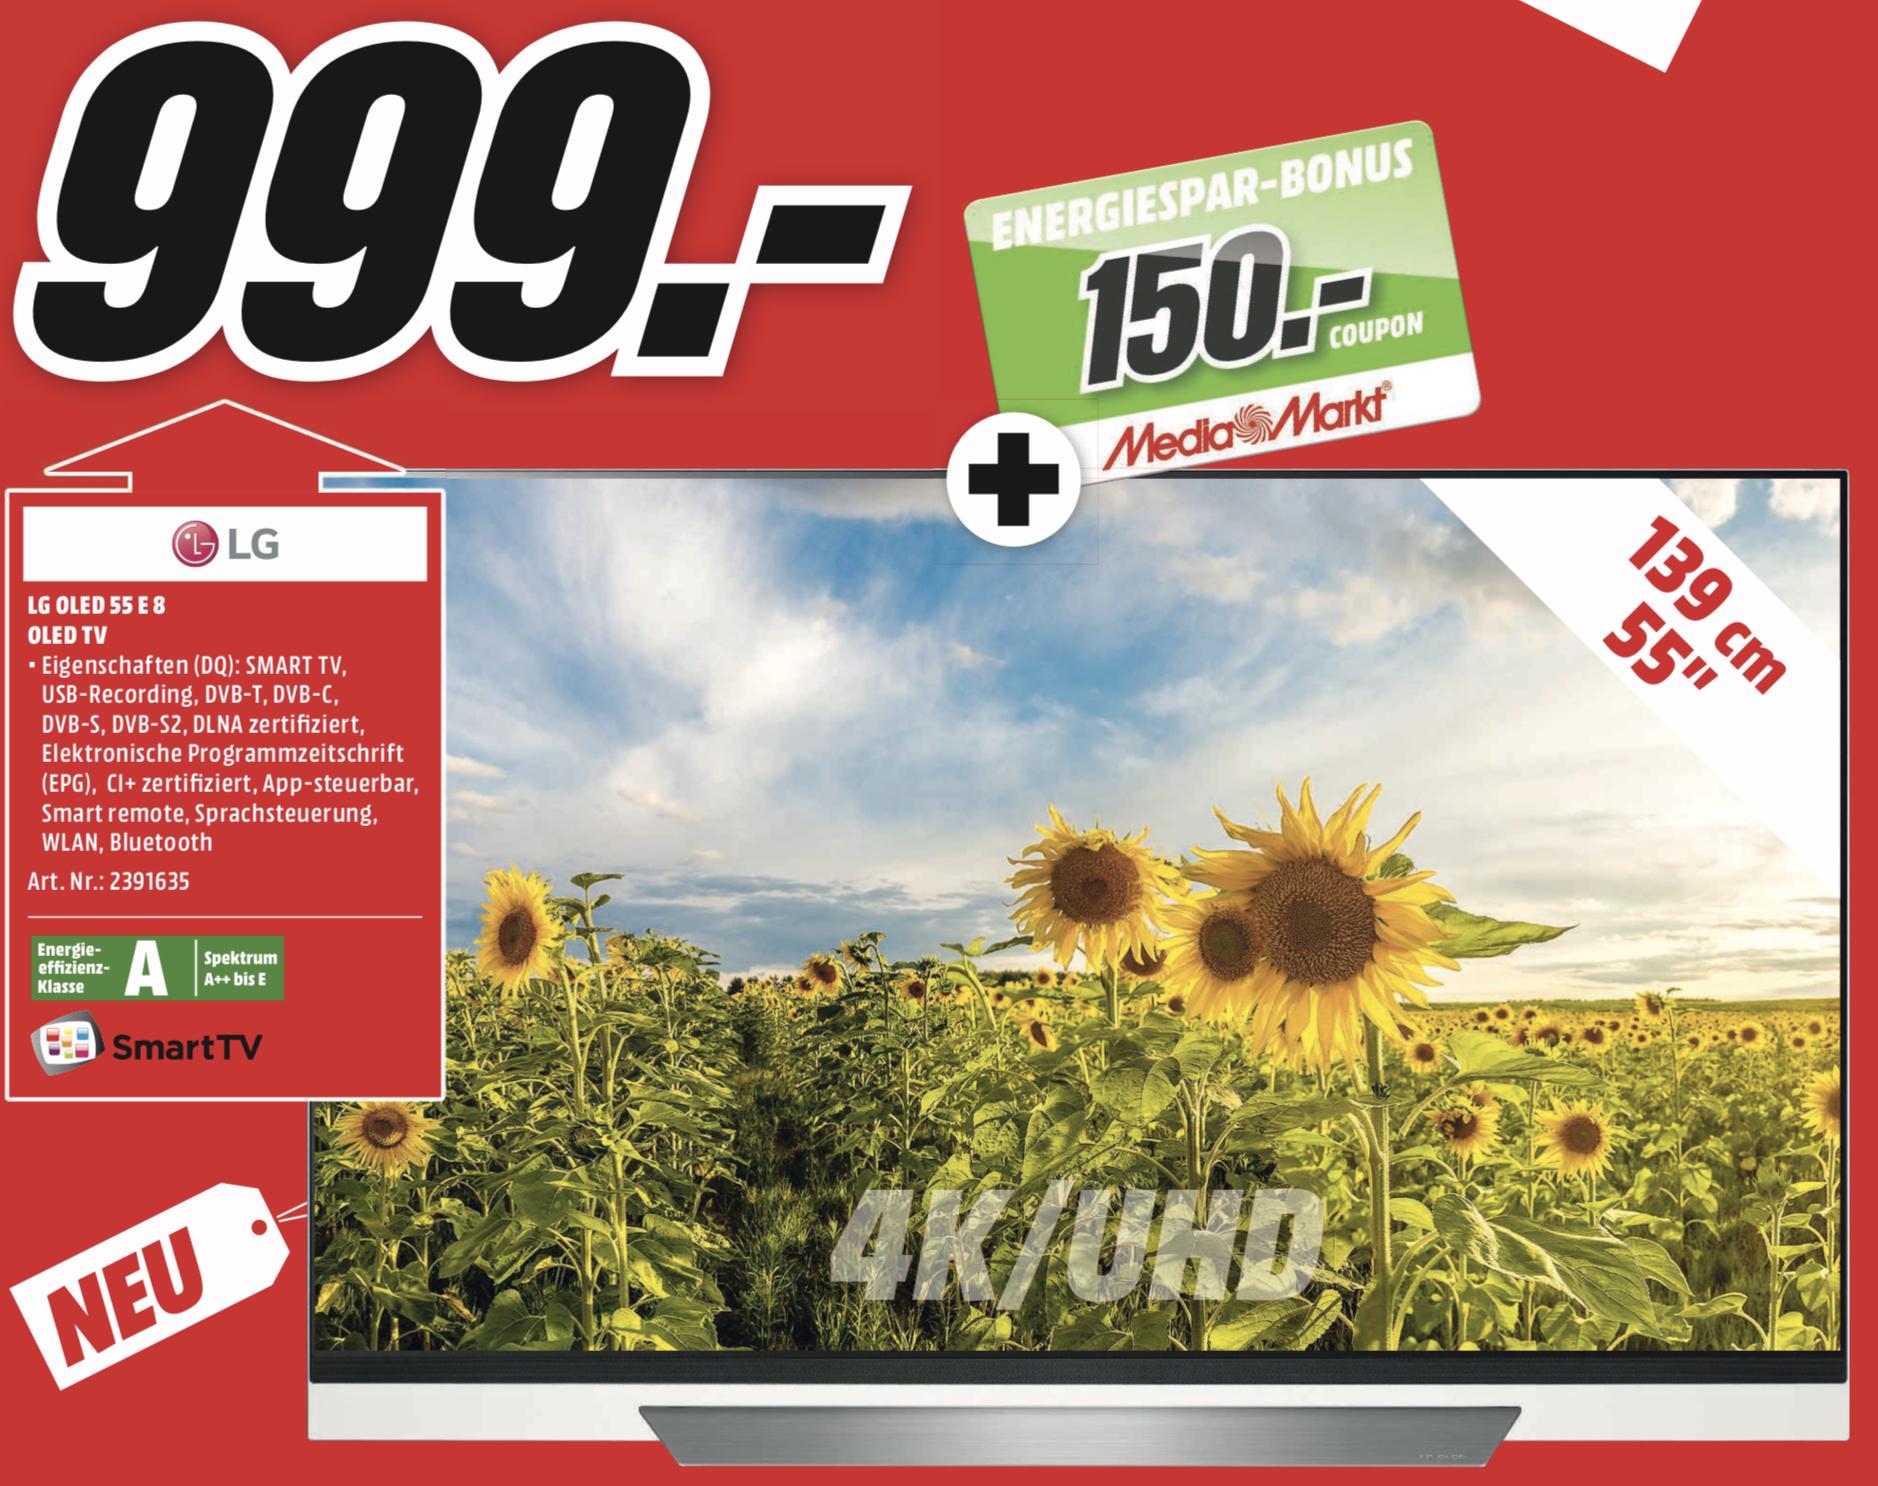 Lokal MediaMarkt Main-Taunus: LG OLED55E8LLA OLED 4K UHD TV 55 Zoll 139cm für 999€ + 150€ Coupon!